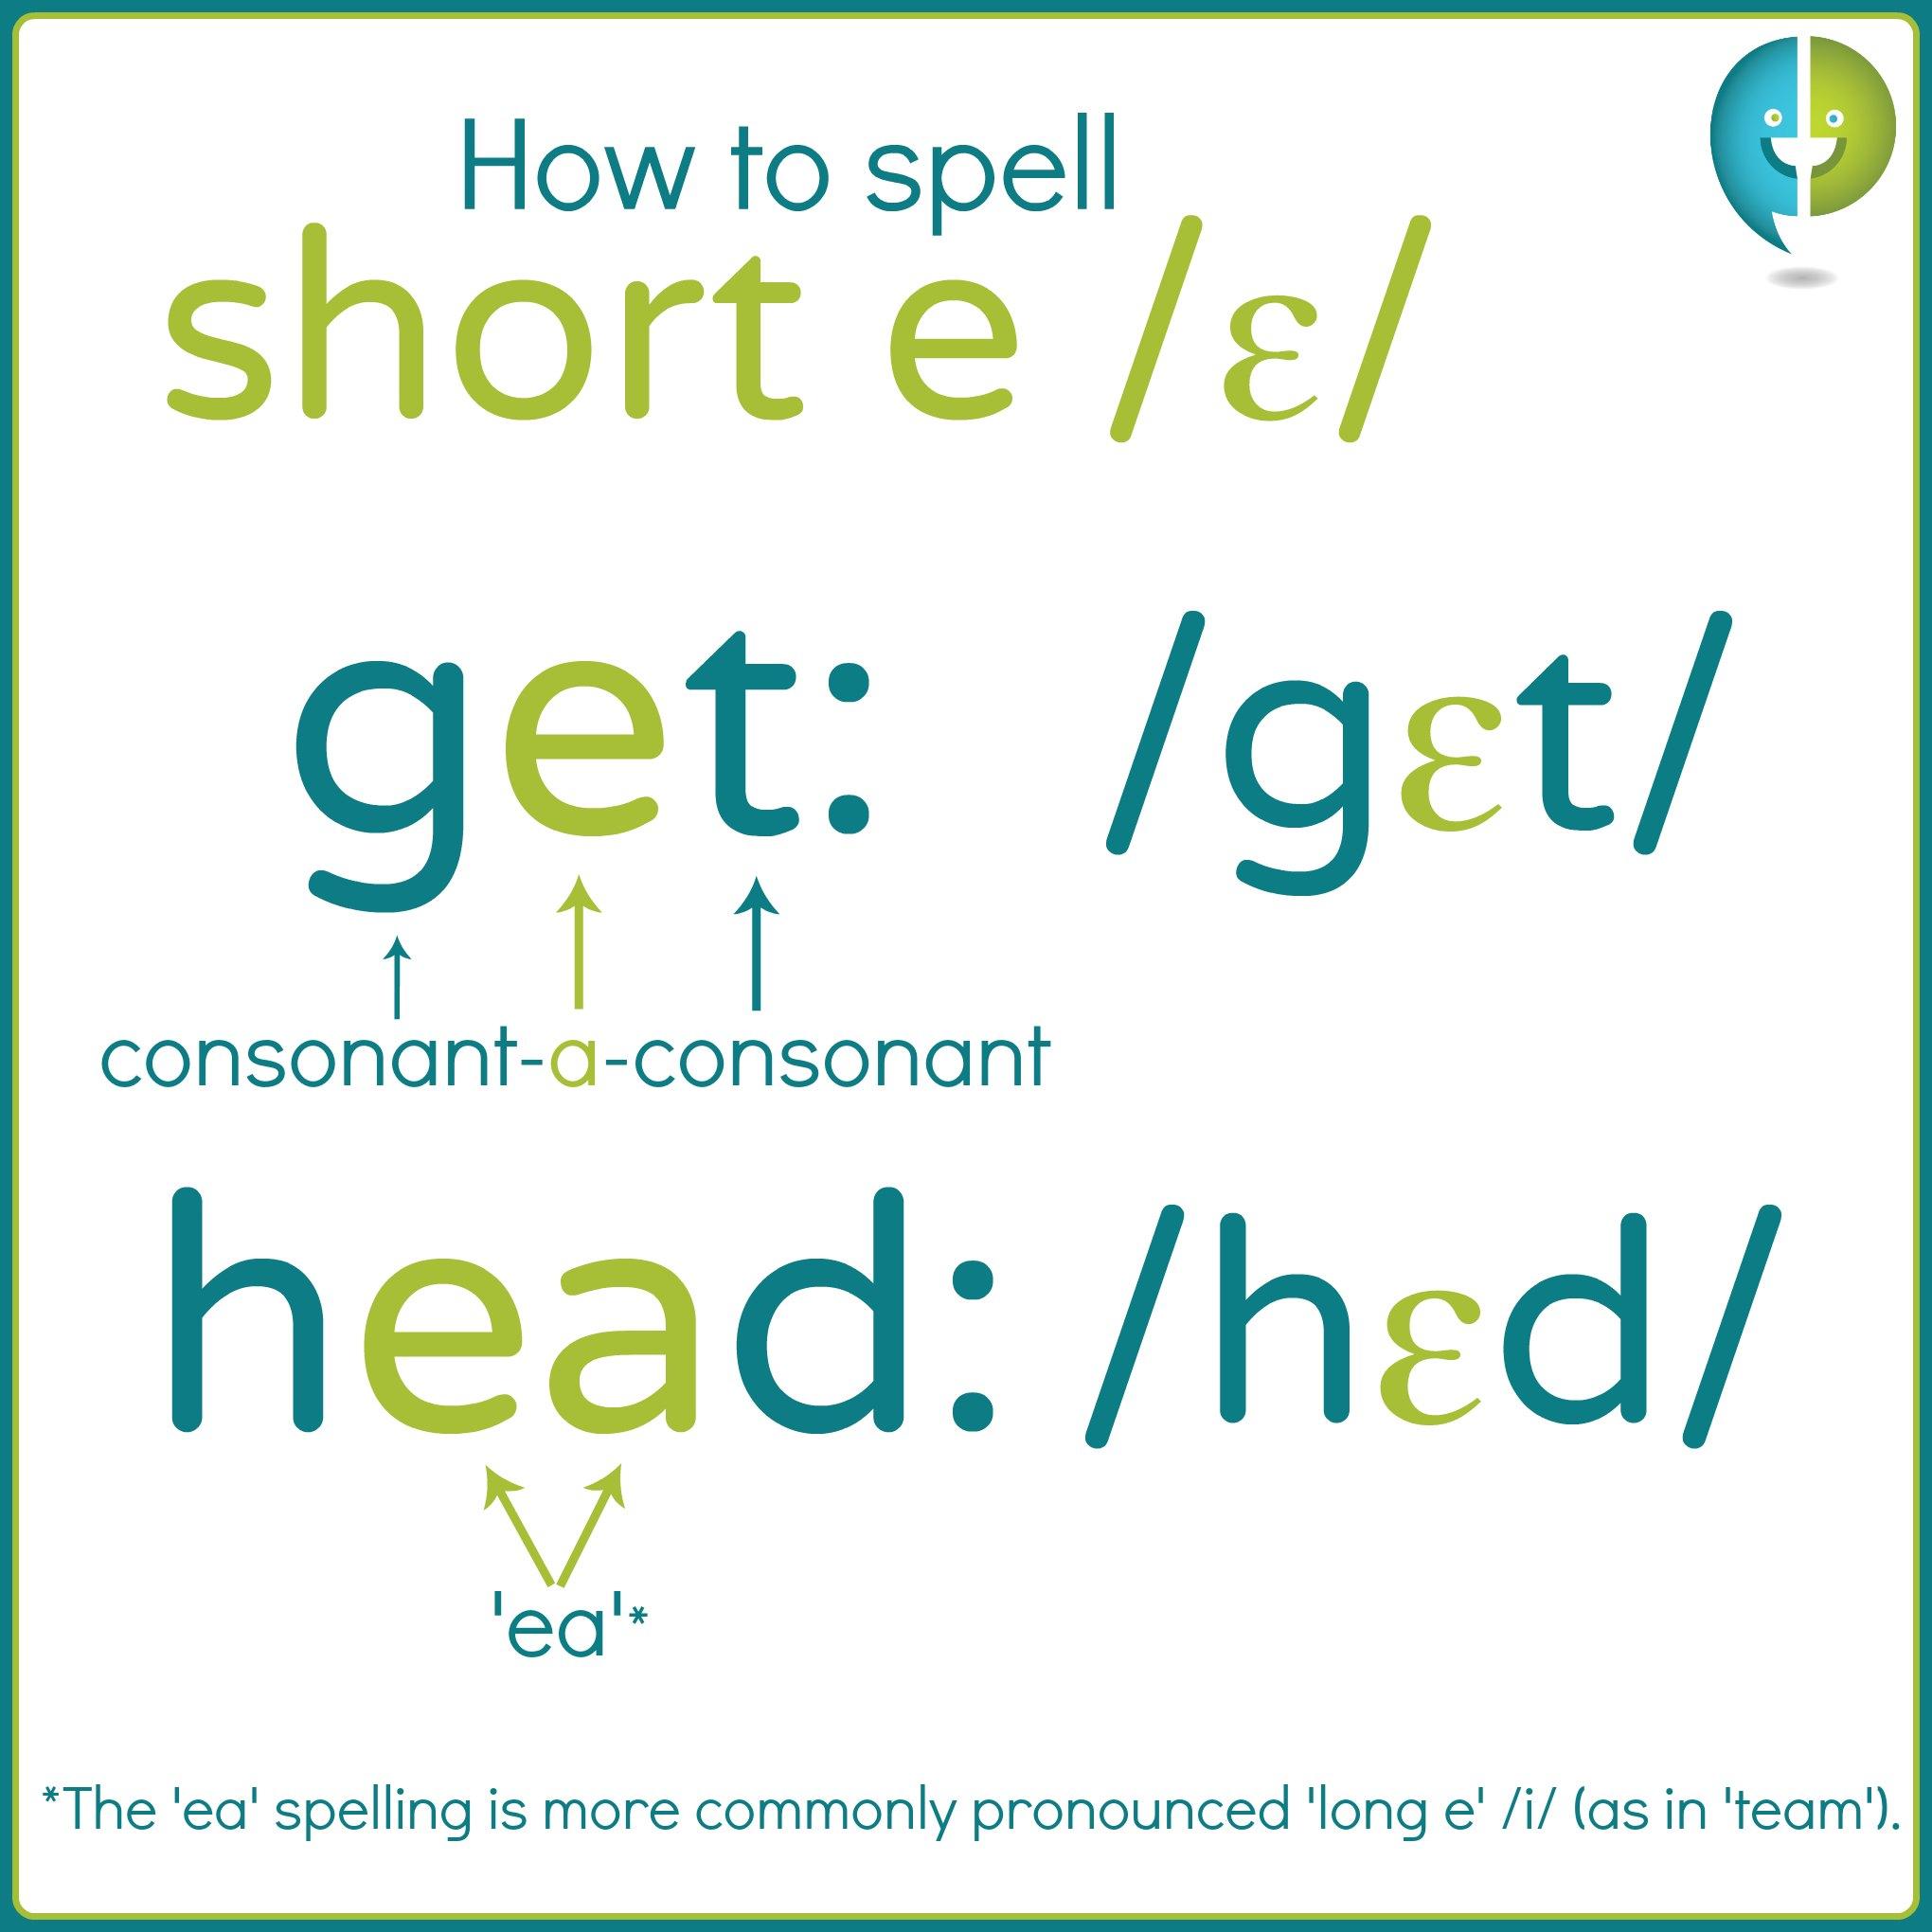 short e /ɛ/ spellings in American English pronunciation